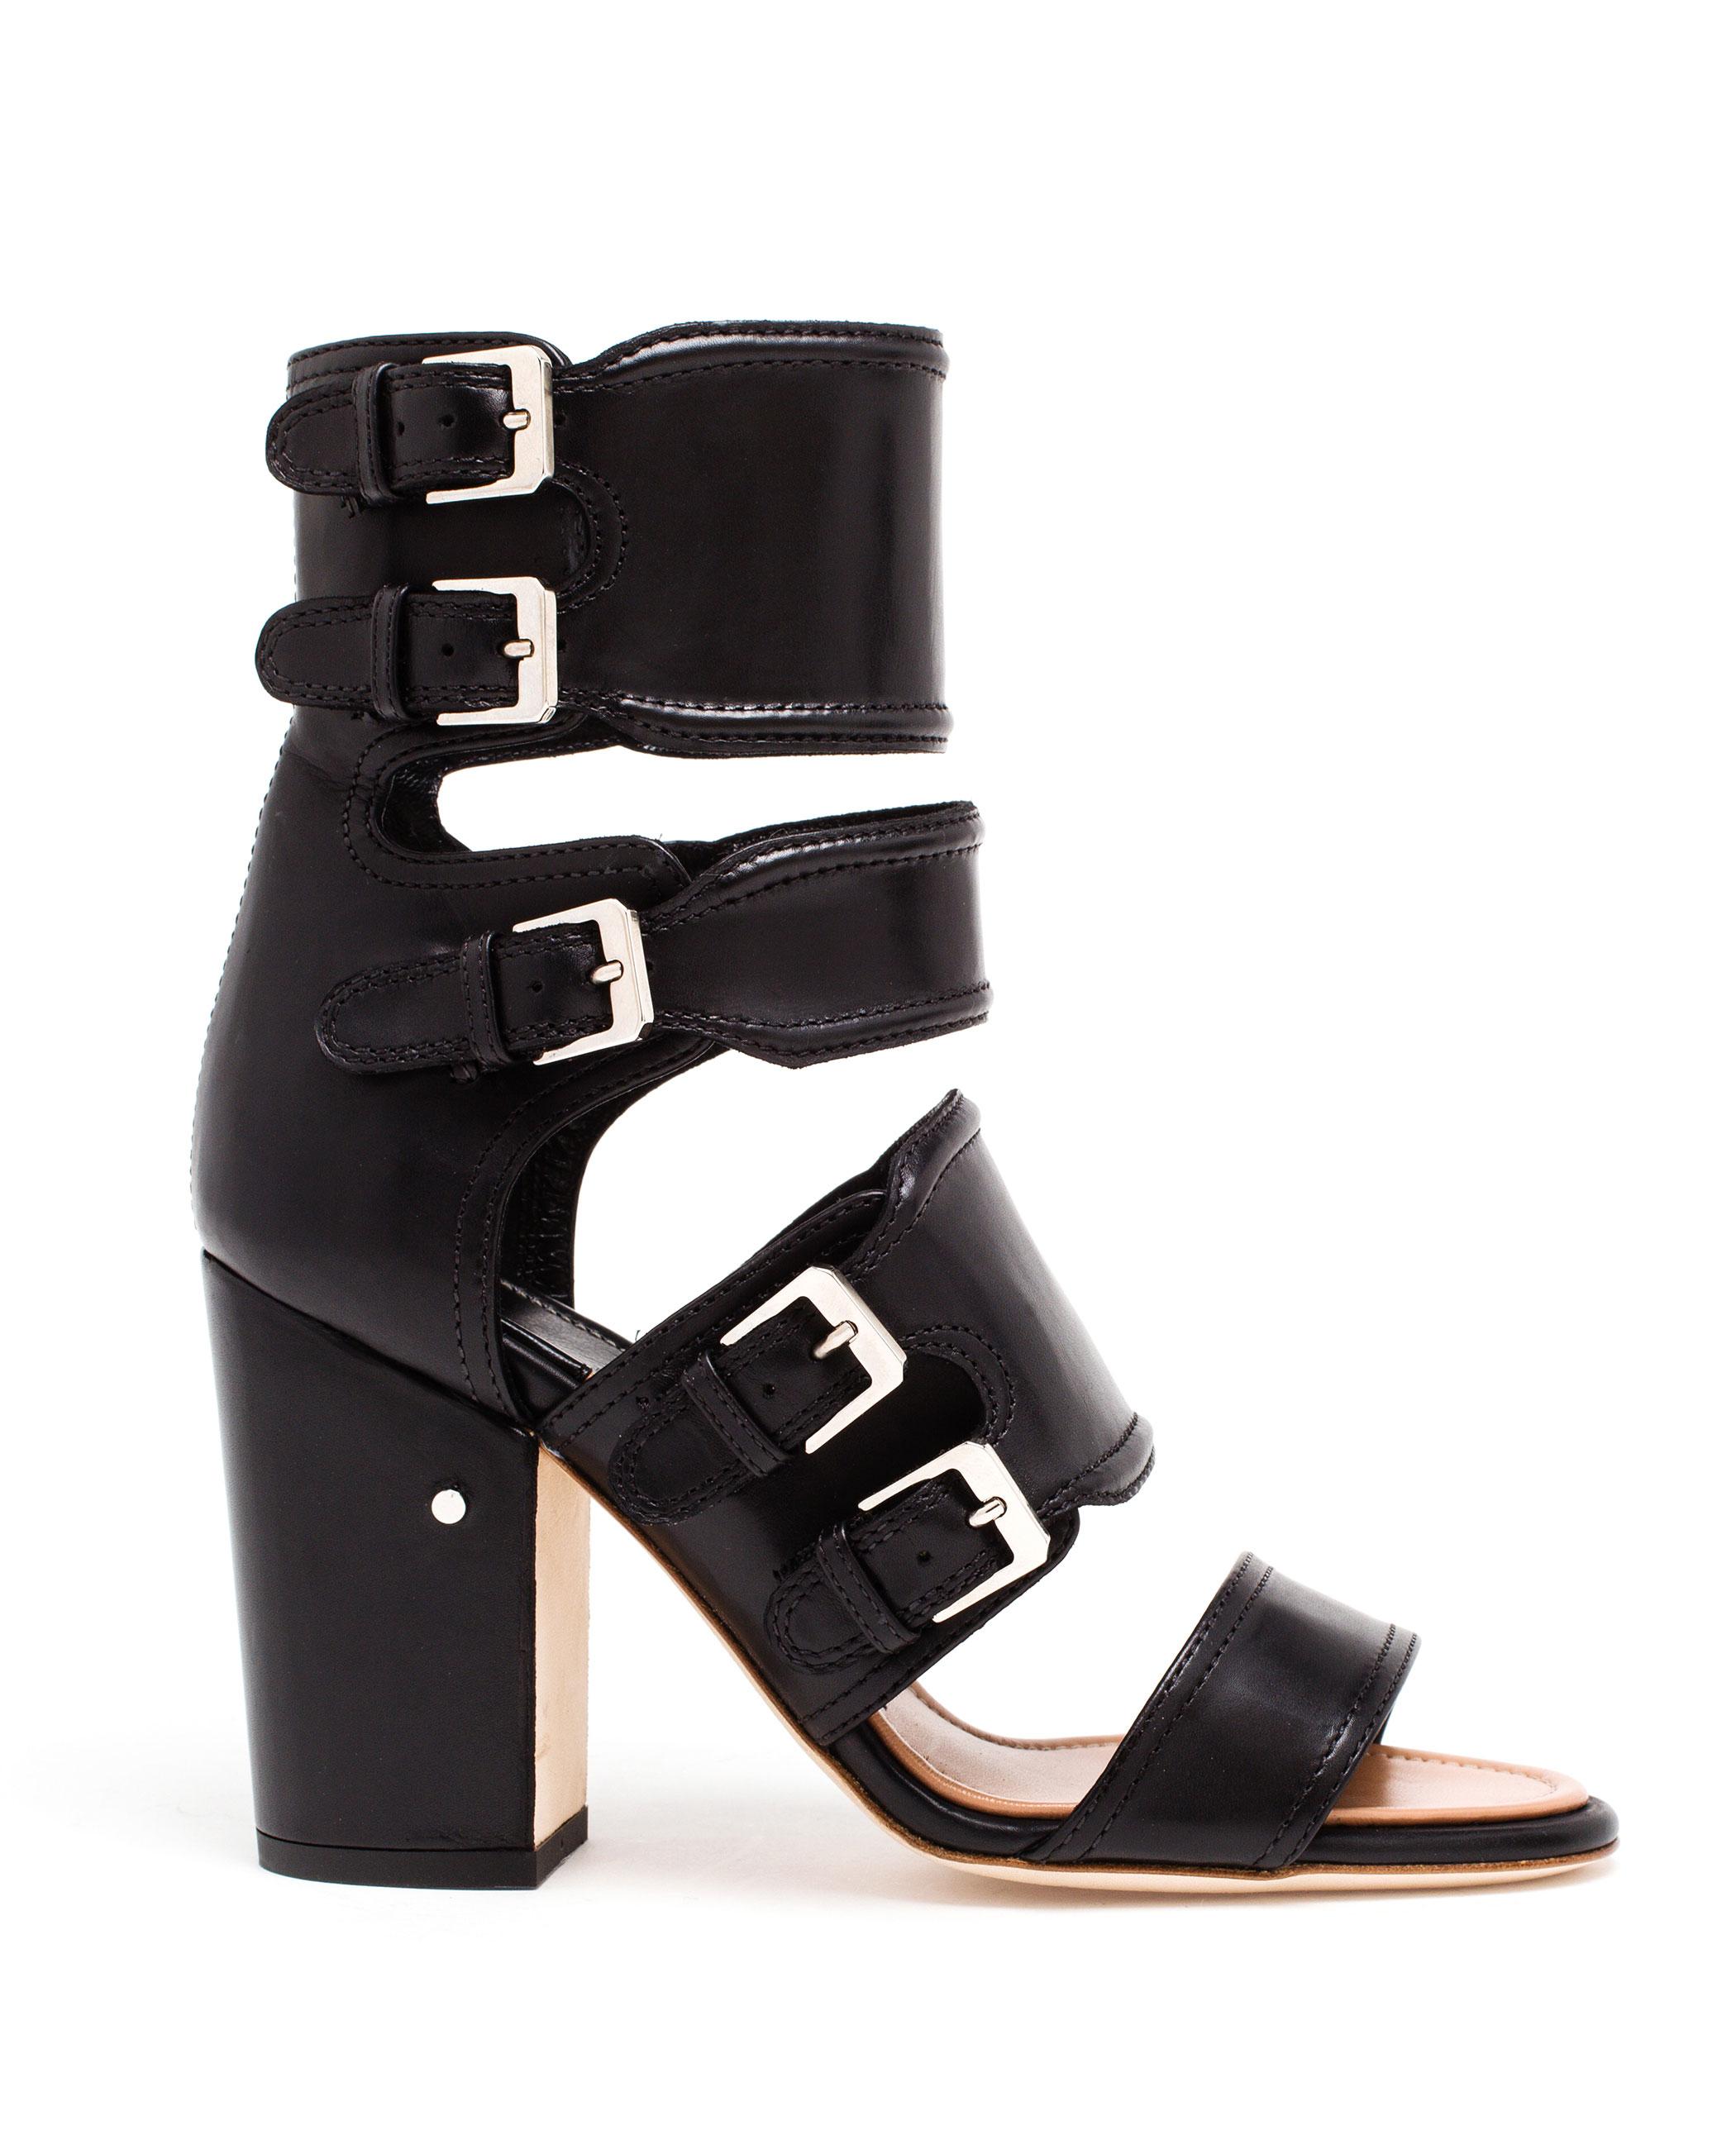 Laurence Dacade Shoes Sale